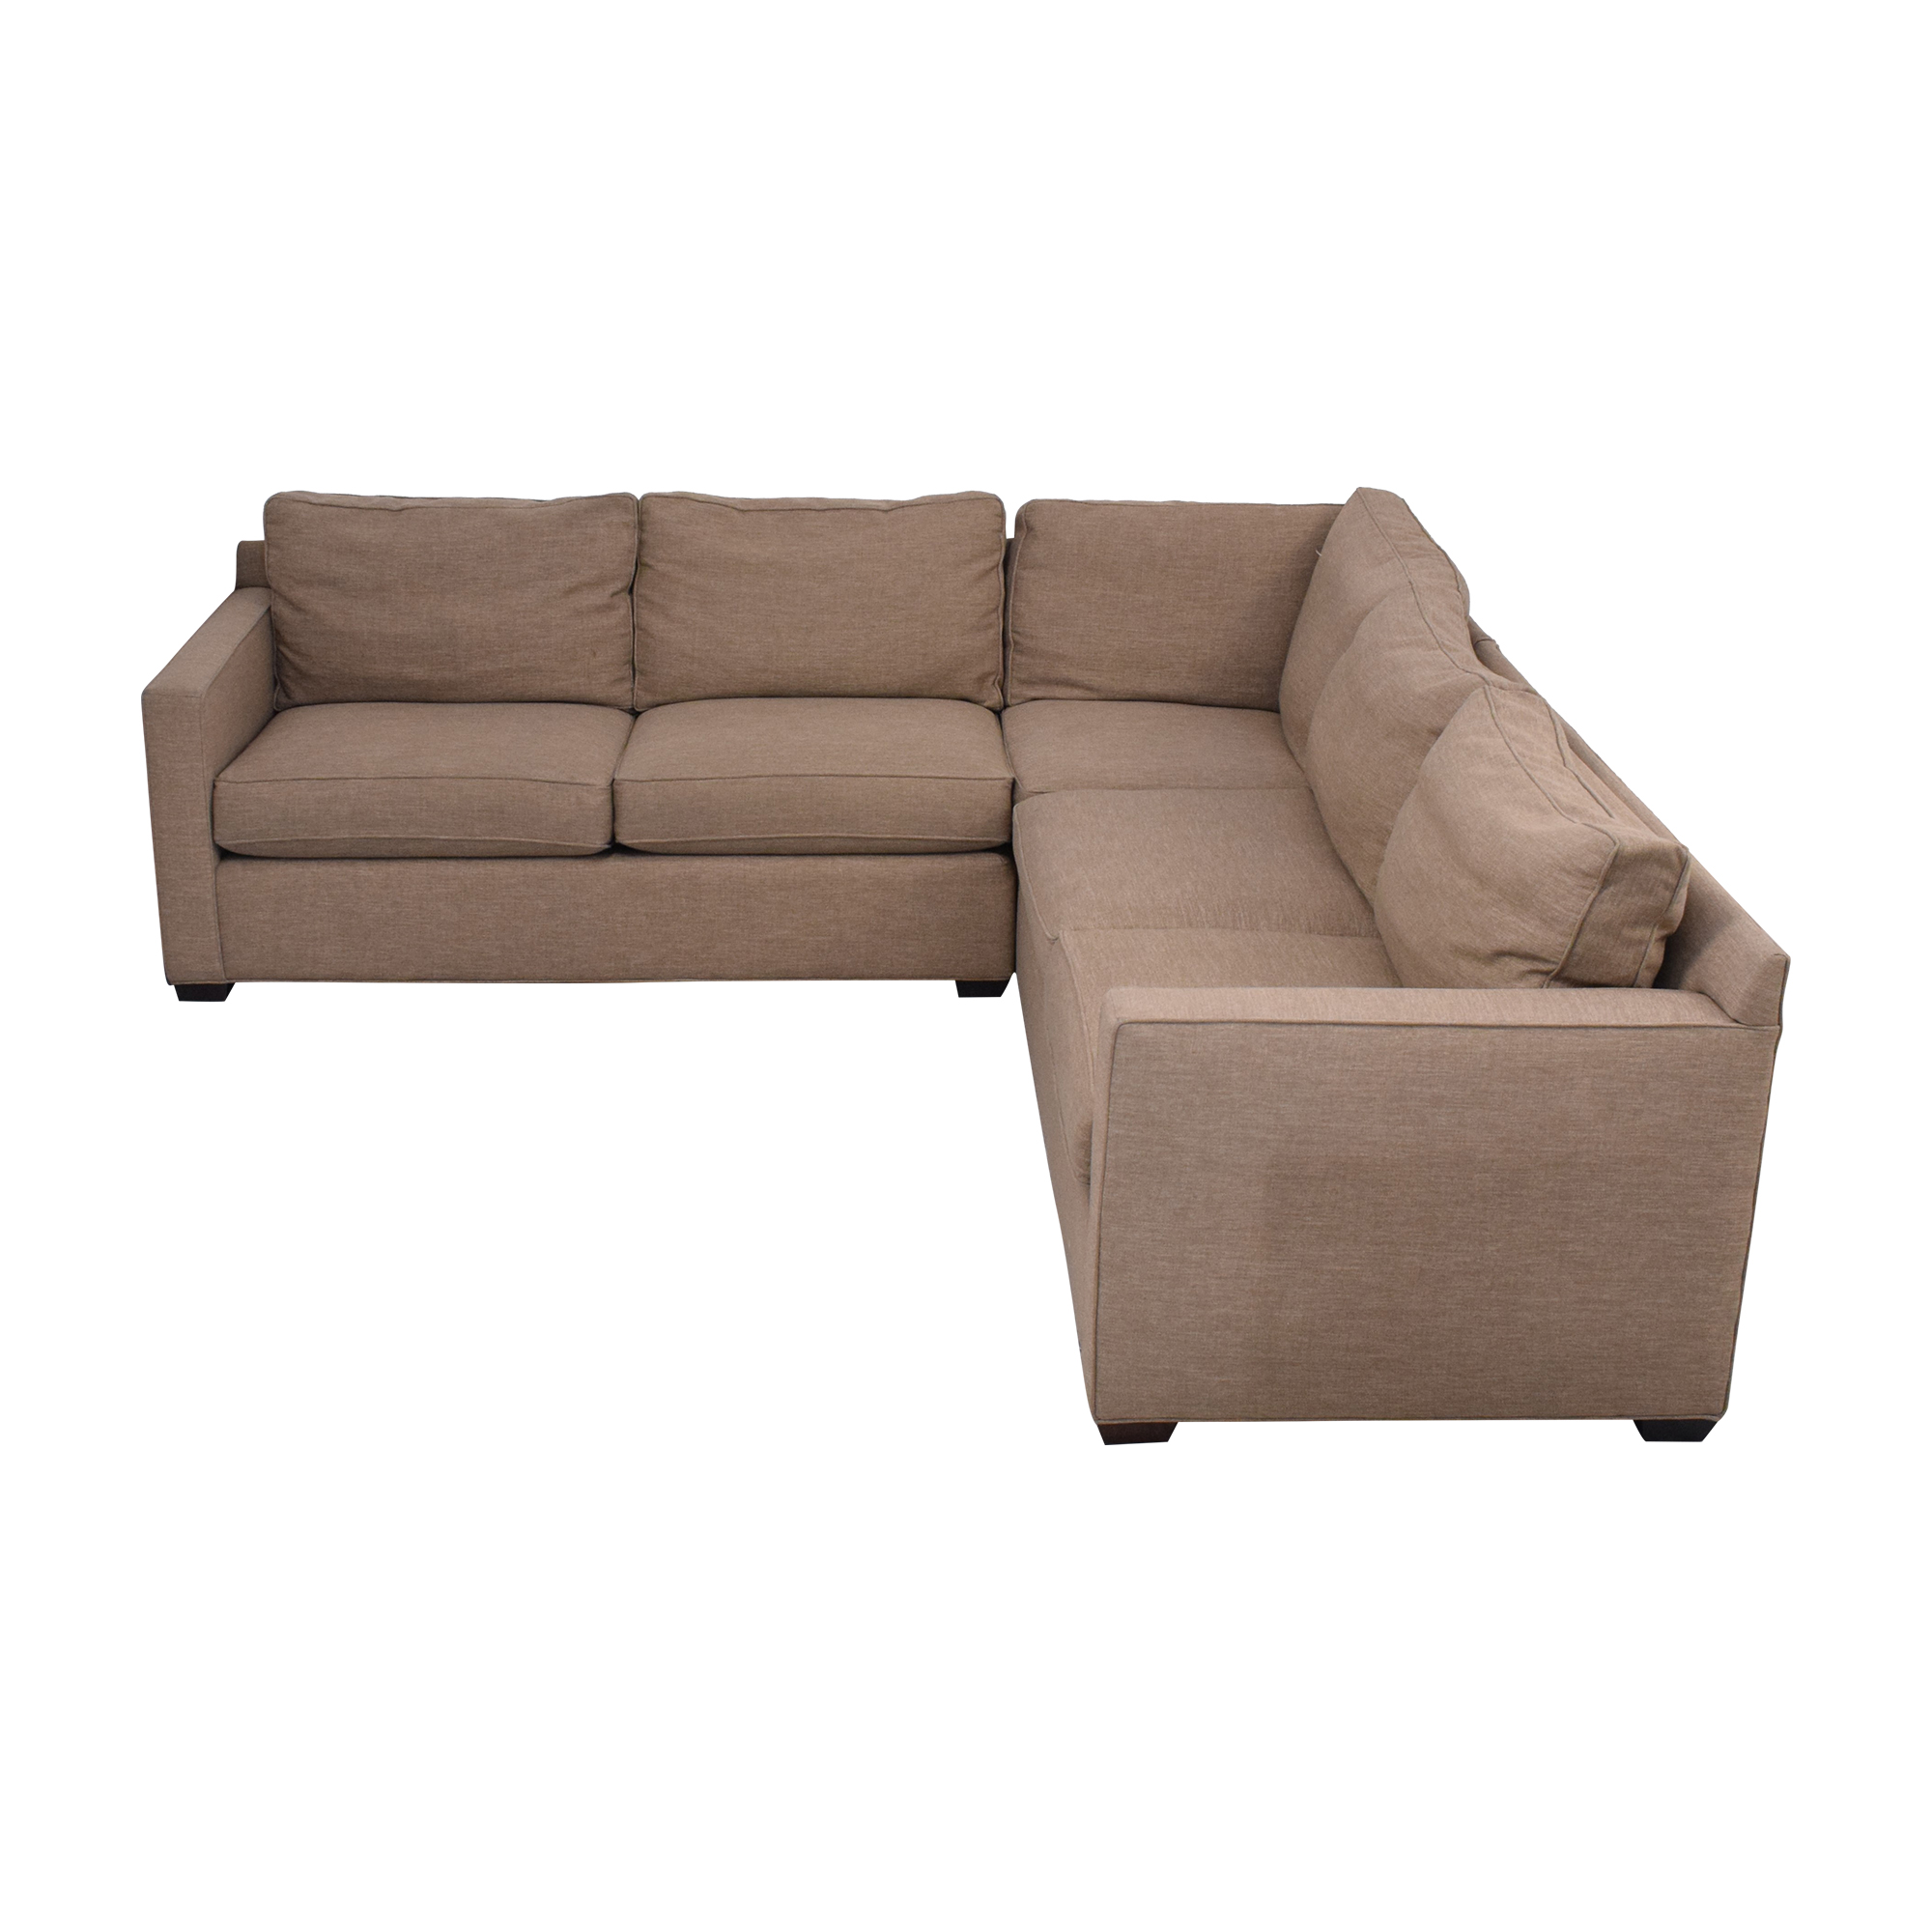 Crate & Barrel Crate & Barrel Davis Sectional Sofa pa